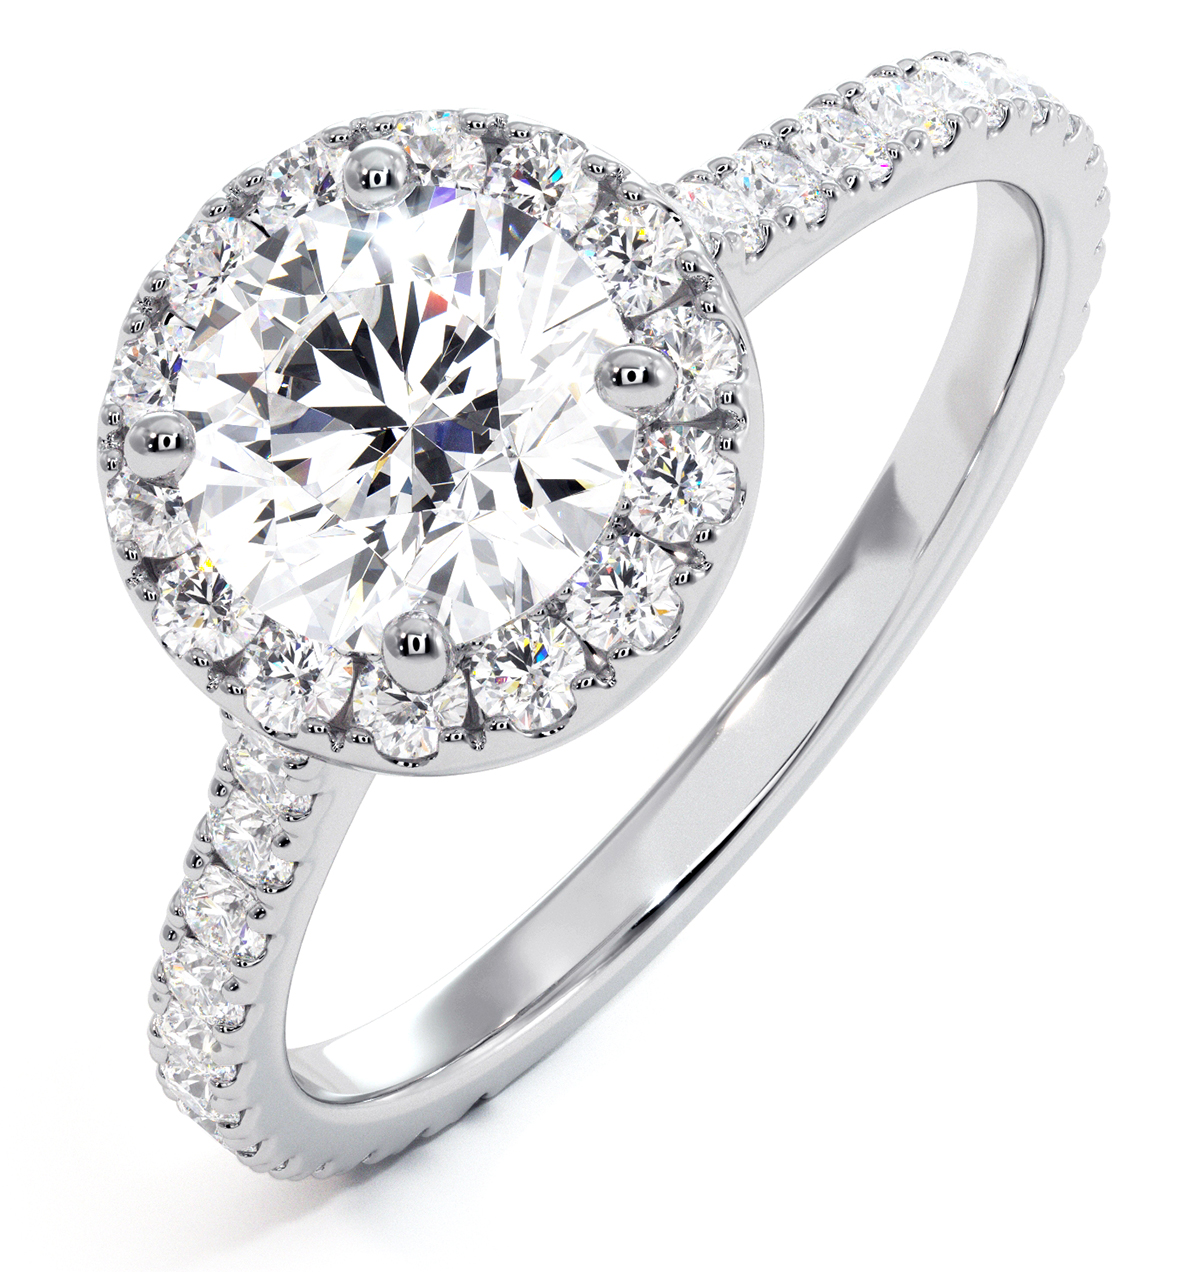 Reina GIA Diamond Halo Engagement Ring in 18K White Gold 1.80ct G/VS1 - image 1